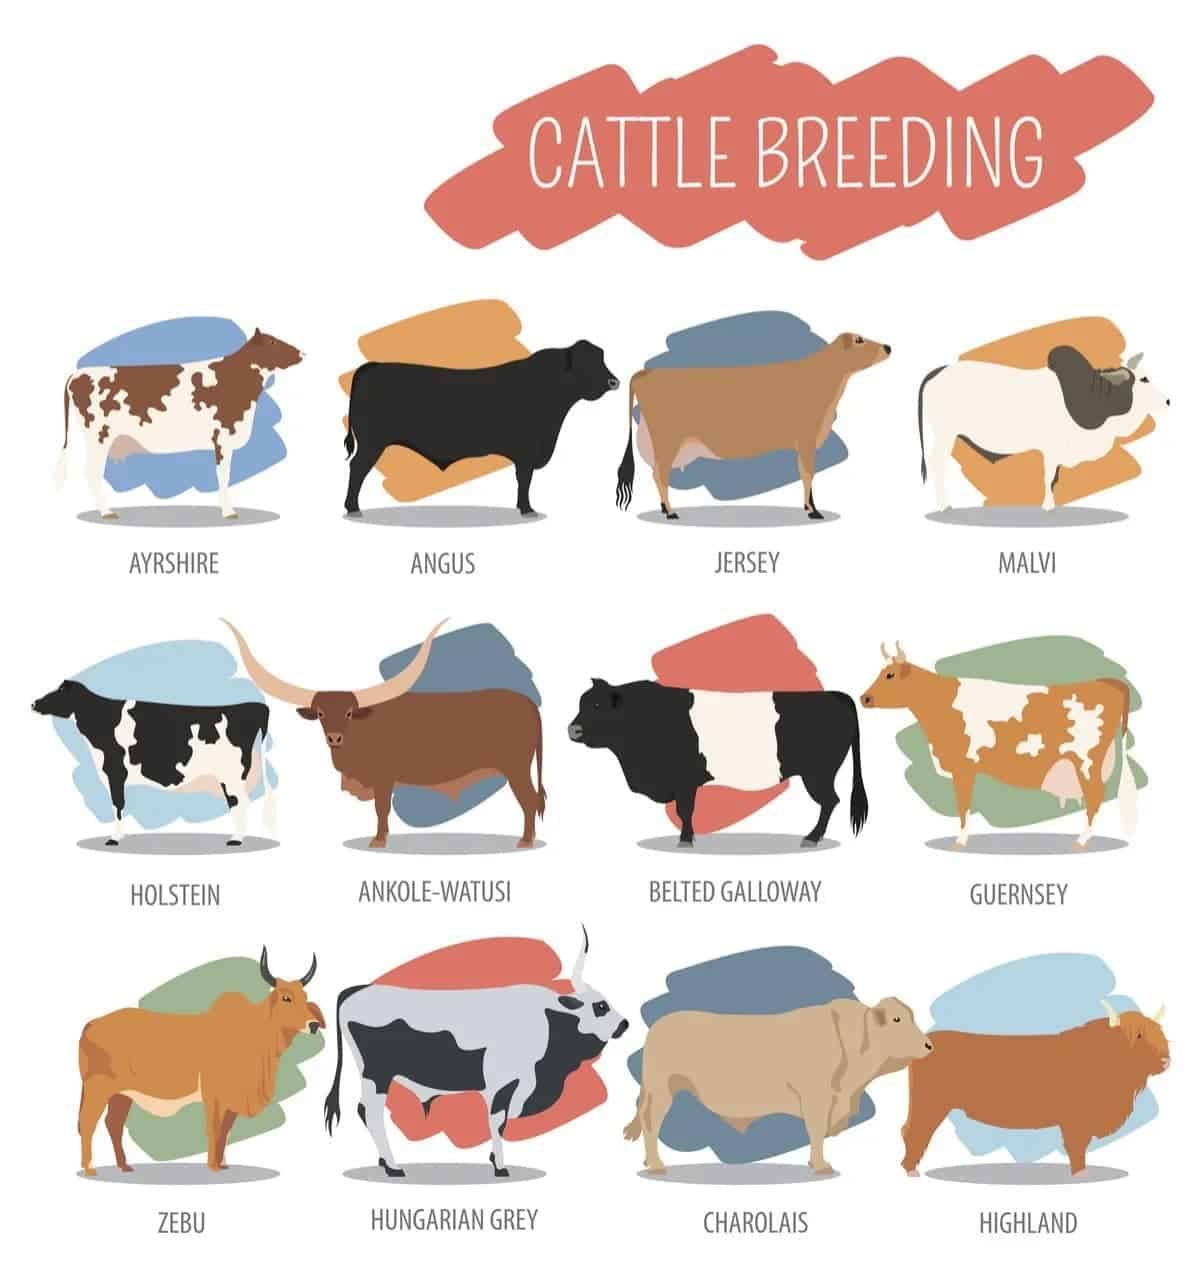 Cattle breeding chart